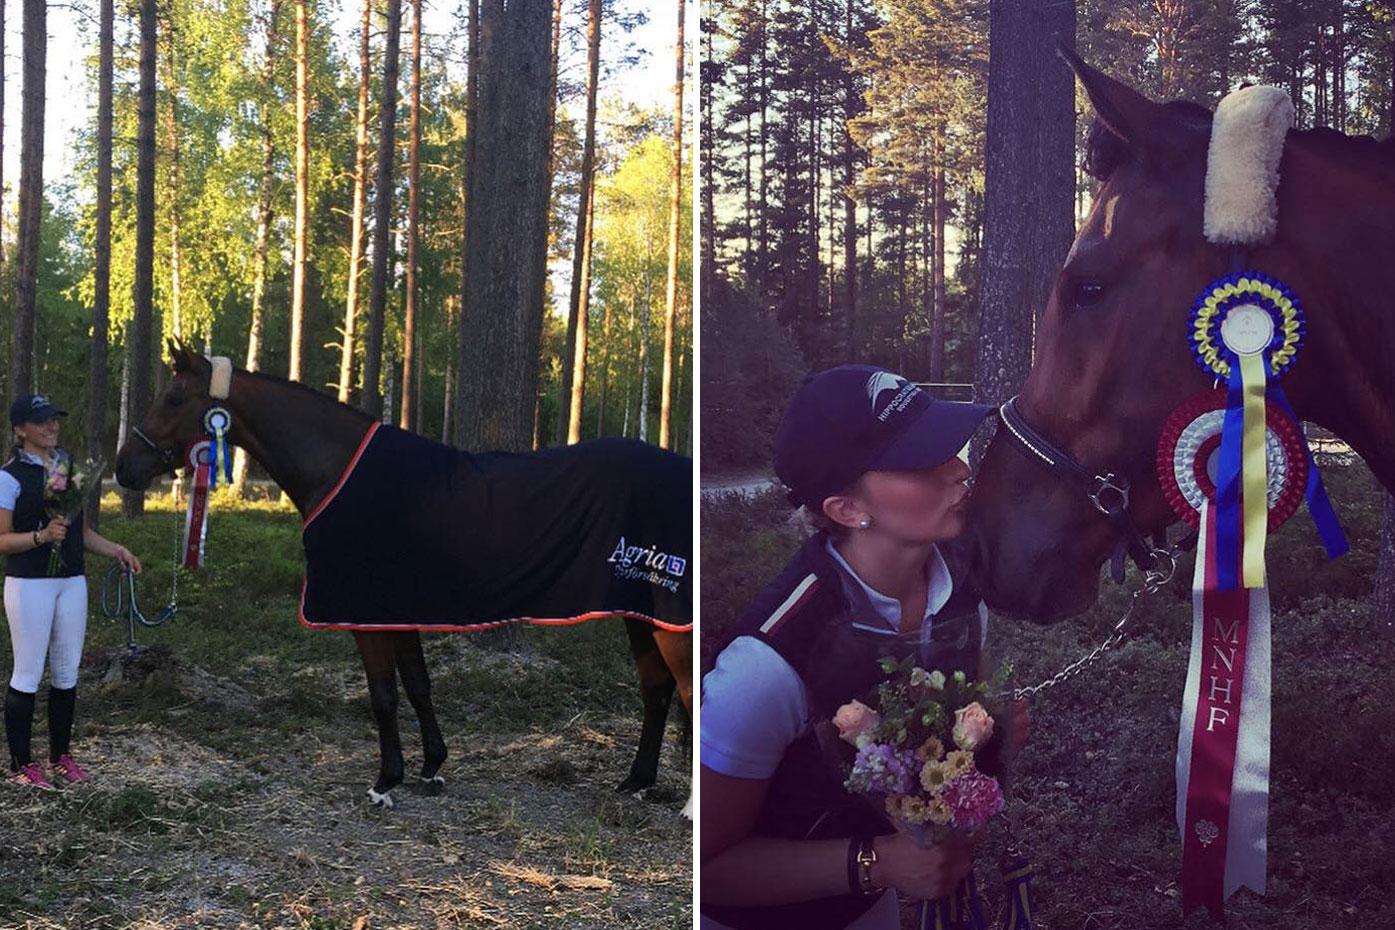 Maggie SWB sto 162 cm e Common Sense u Etoscha e Tolan R, uppf Stall Österlund, äg Cecilia, Emilia & Olivia Bergåkra. (8,5 8) = 81,7% diplom C